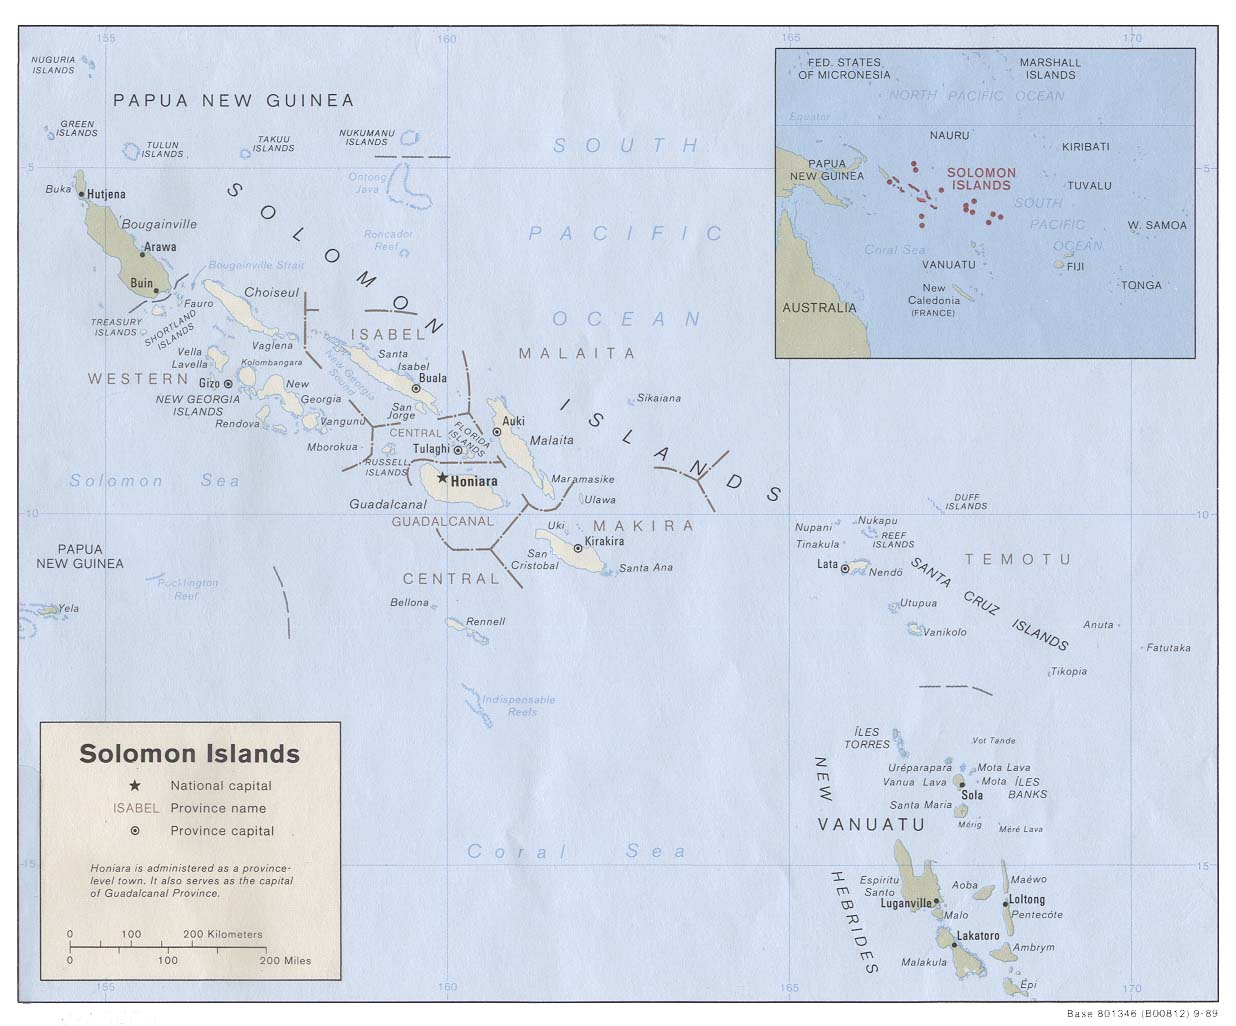 Map of the Solomon Islands